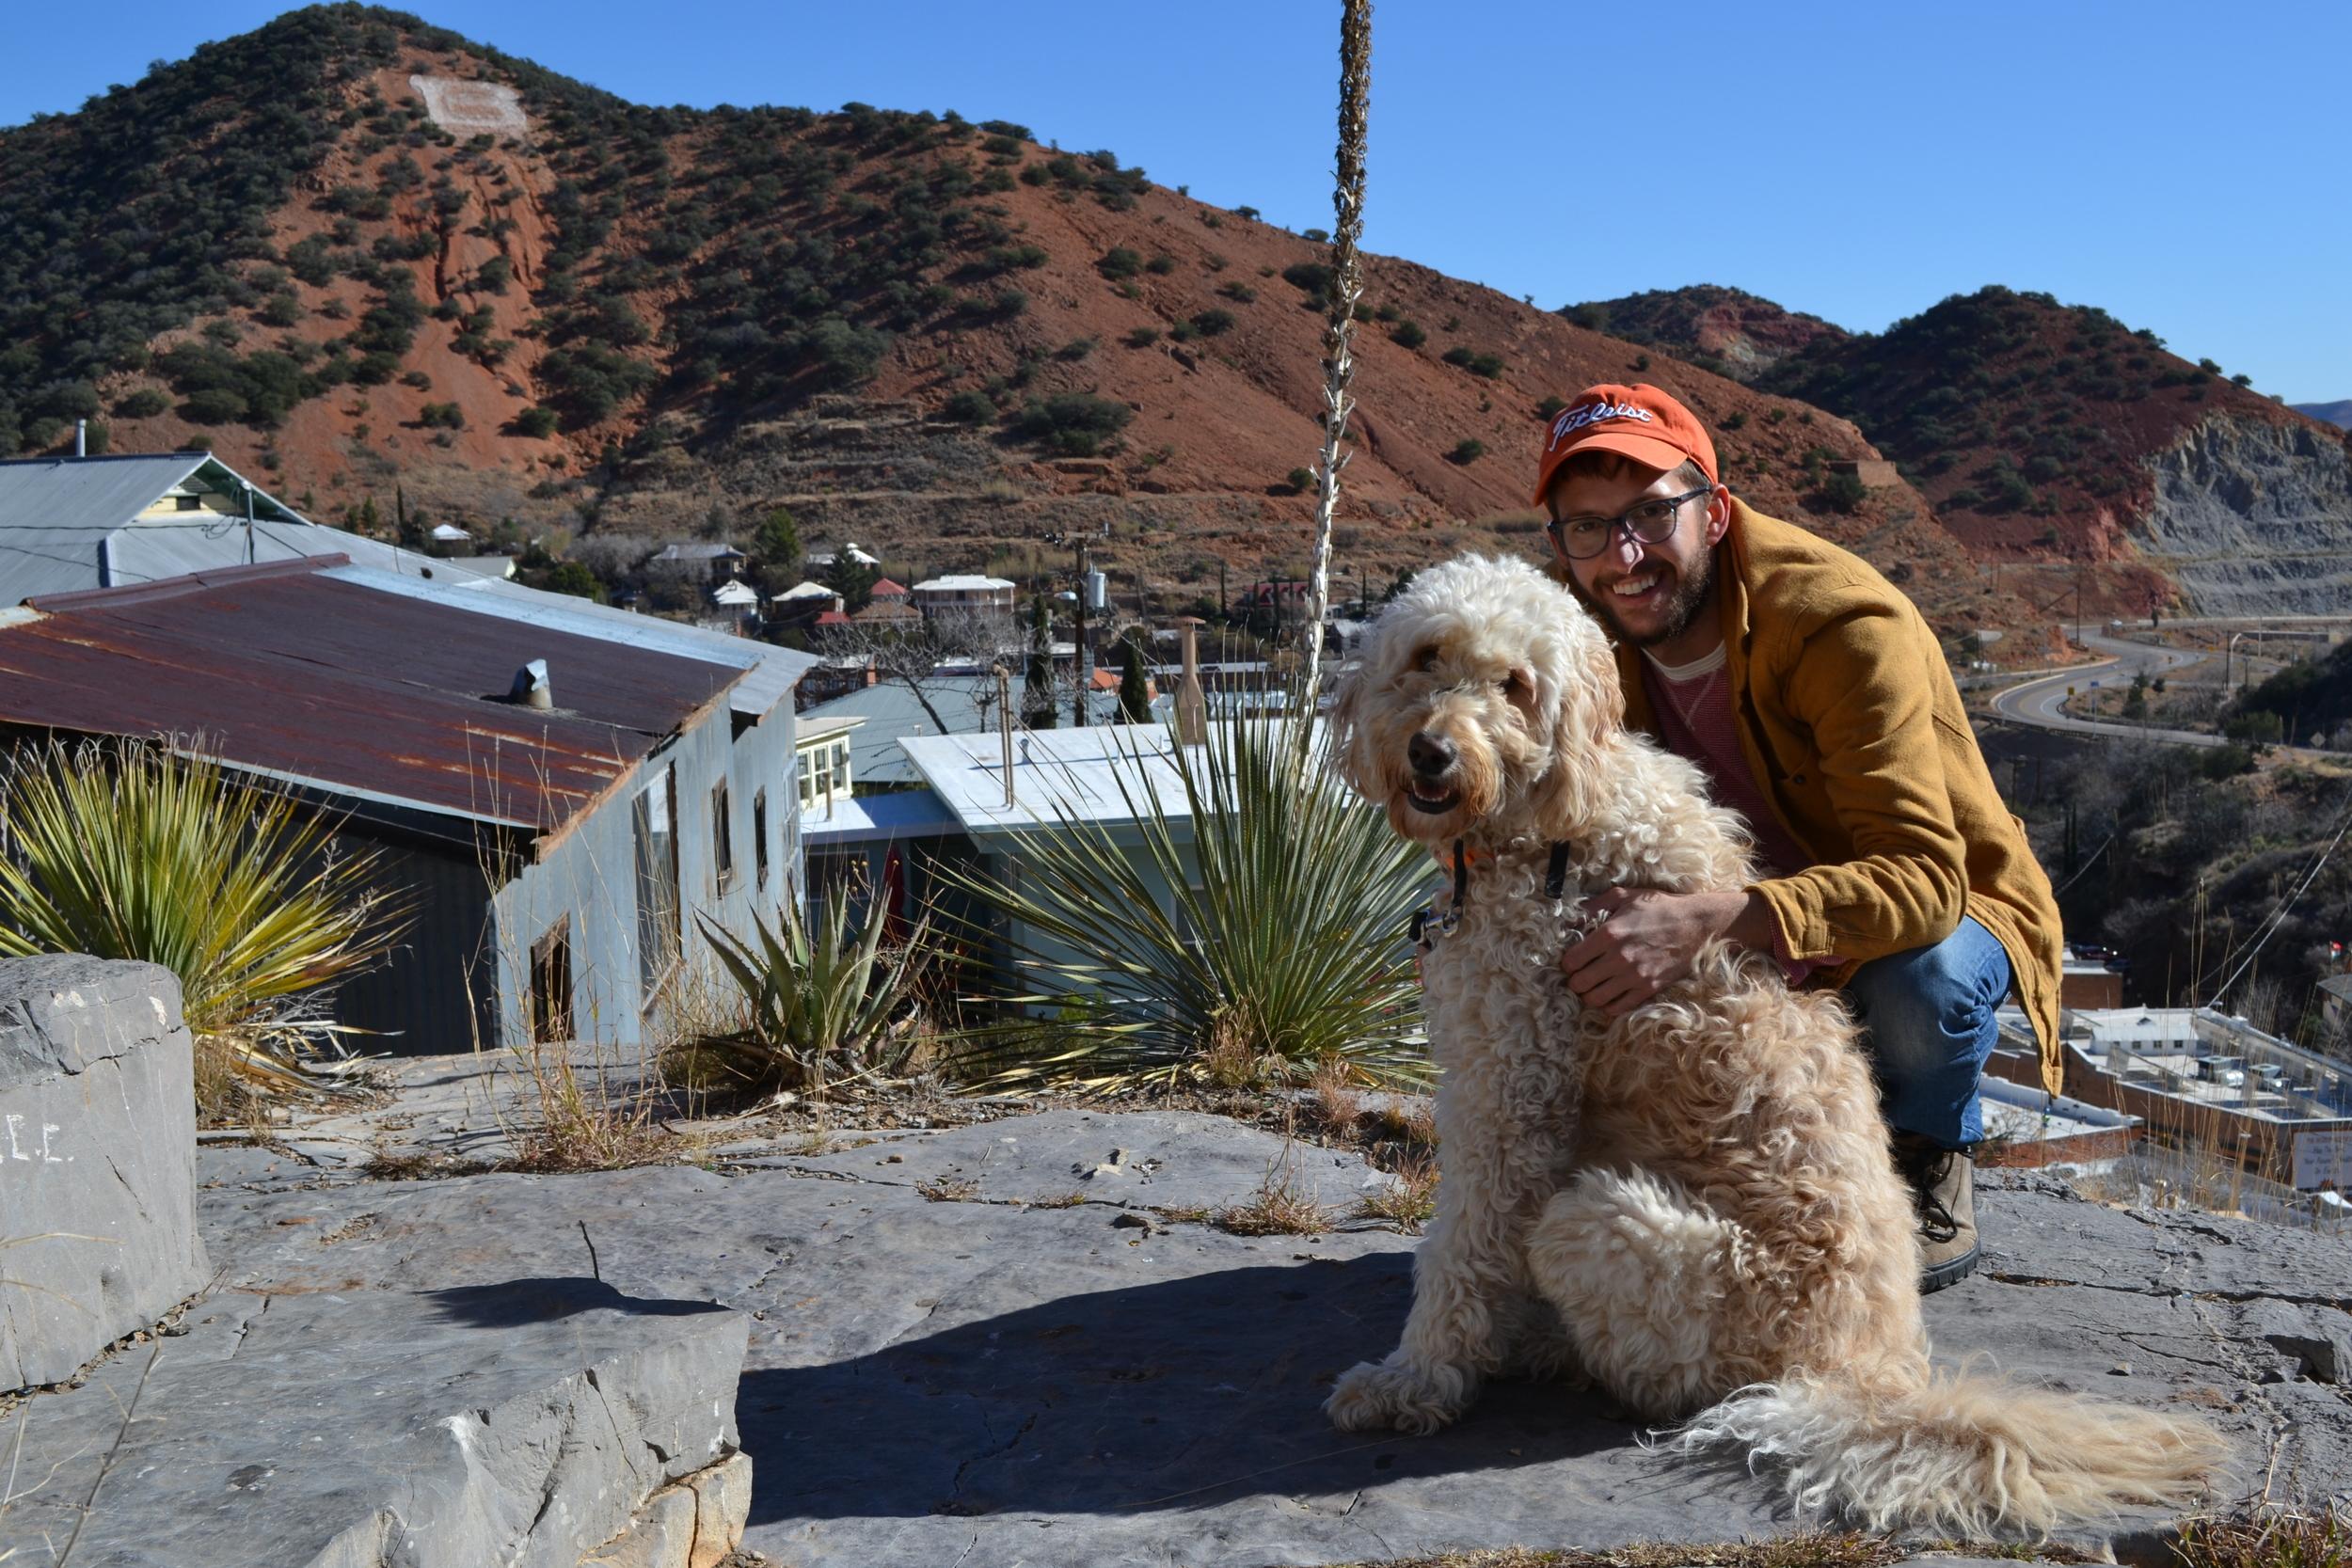 Just me and my dog, chilling above Bisbee, Arizona.